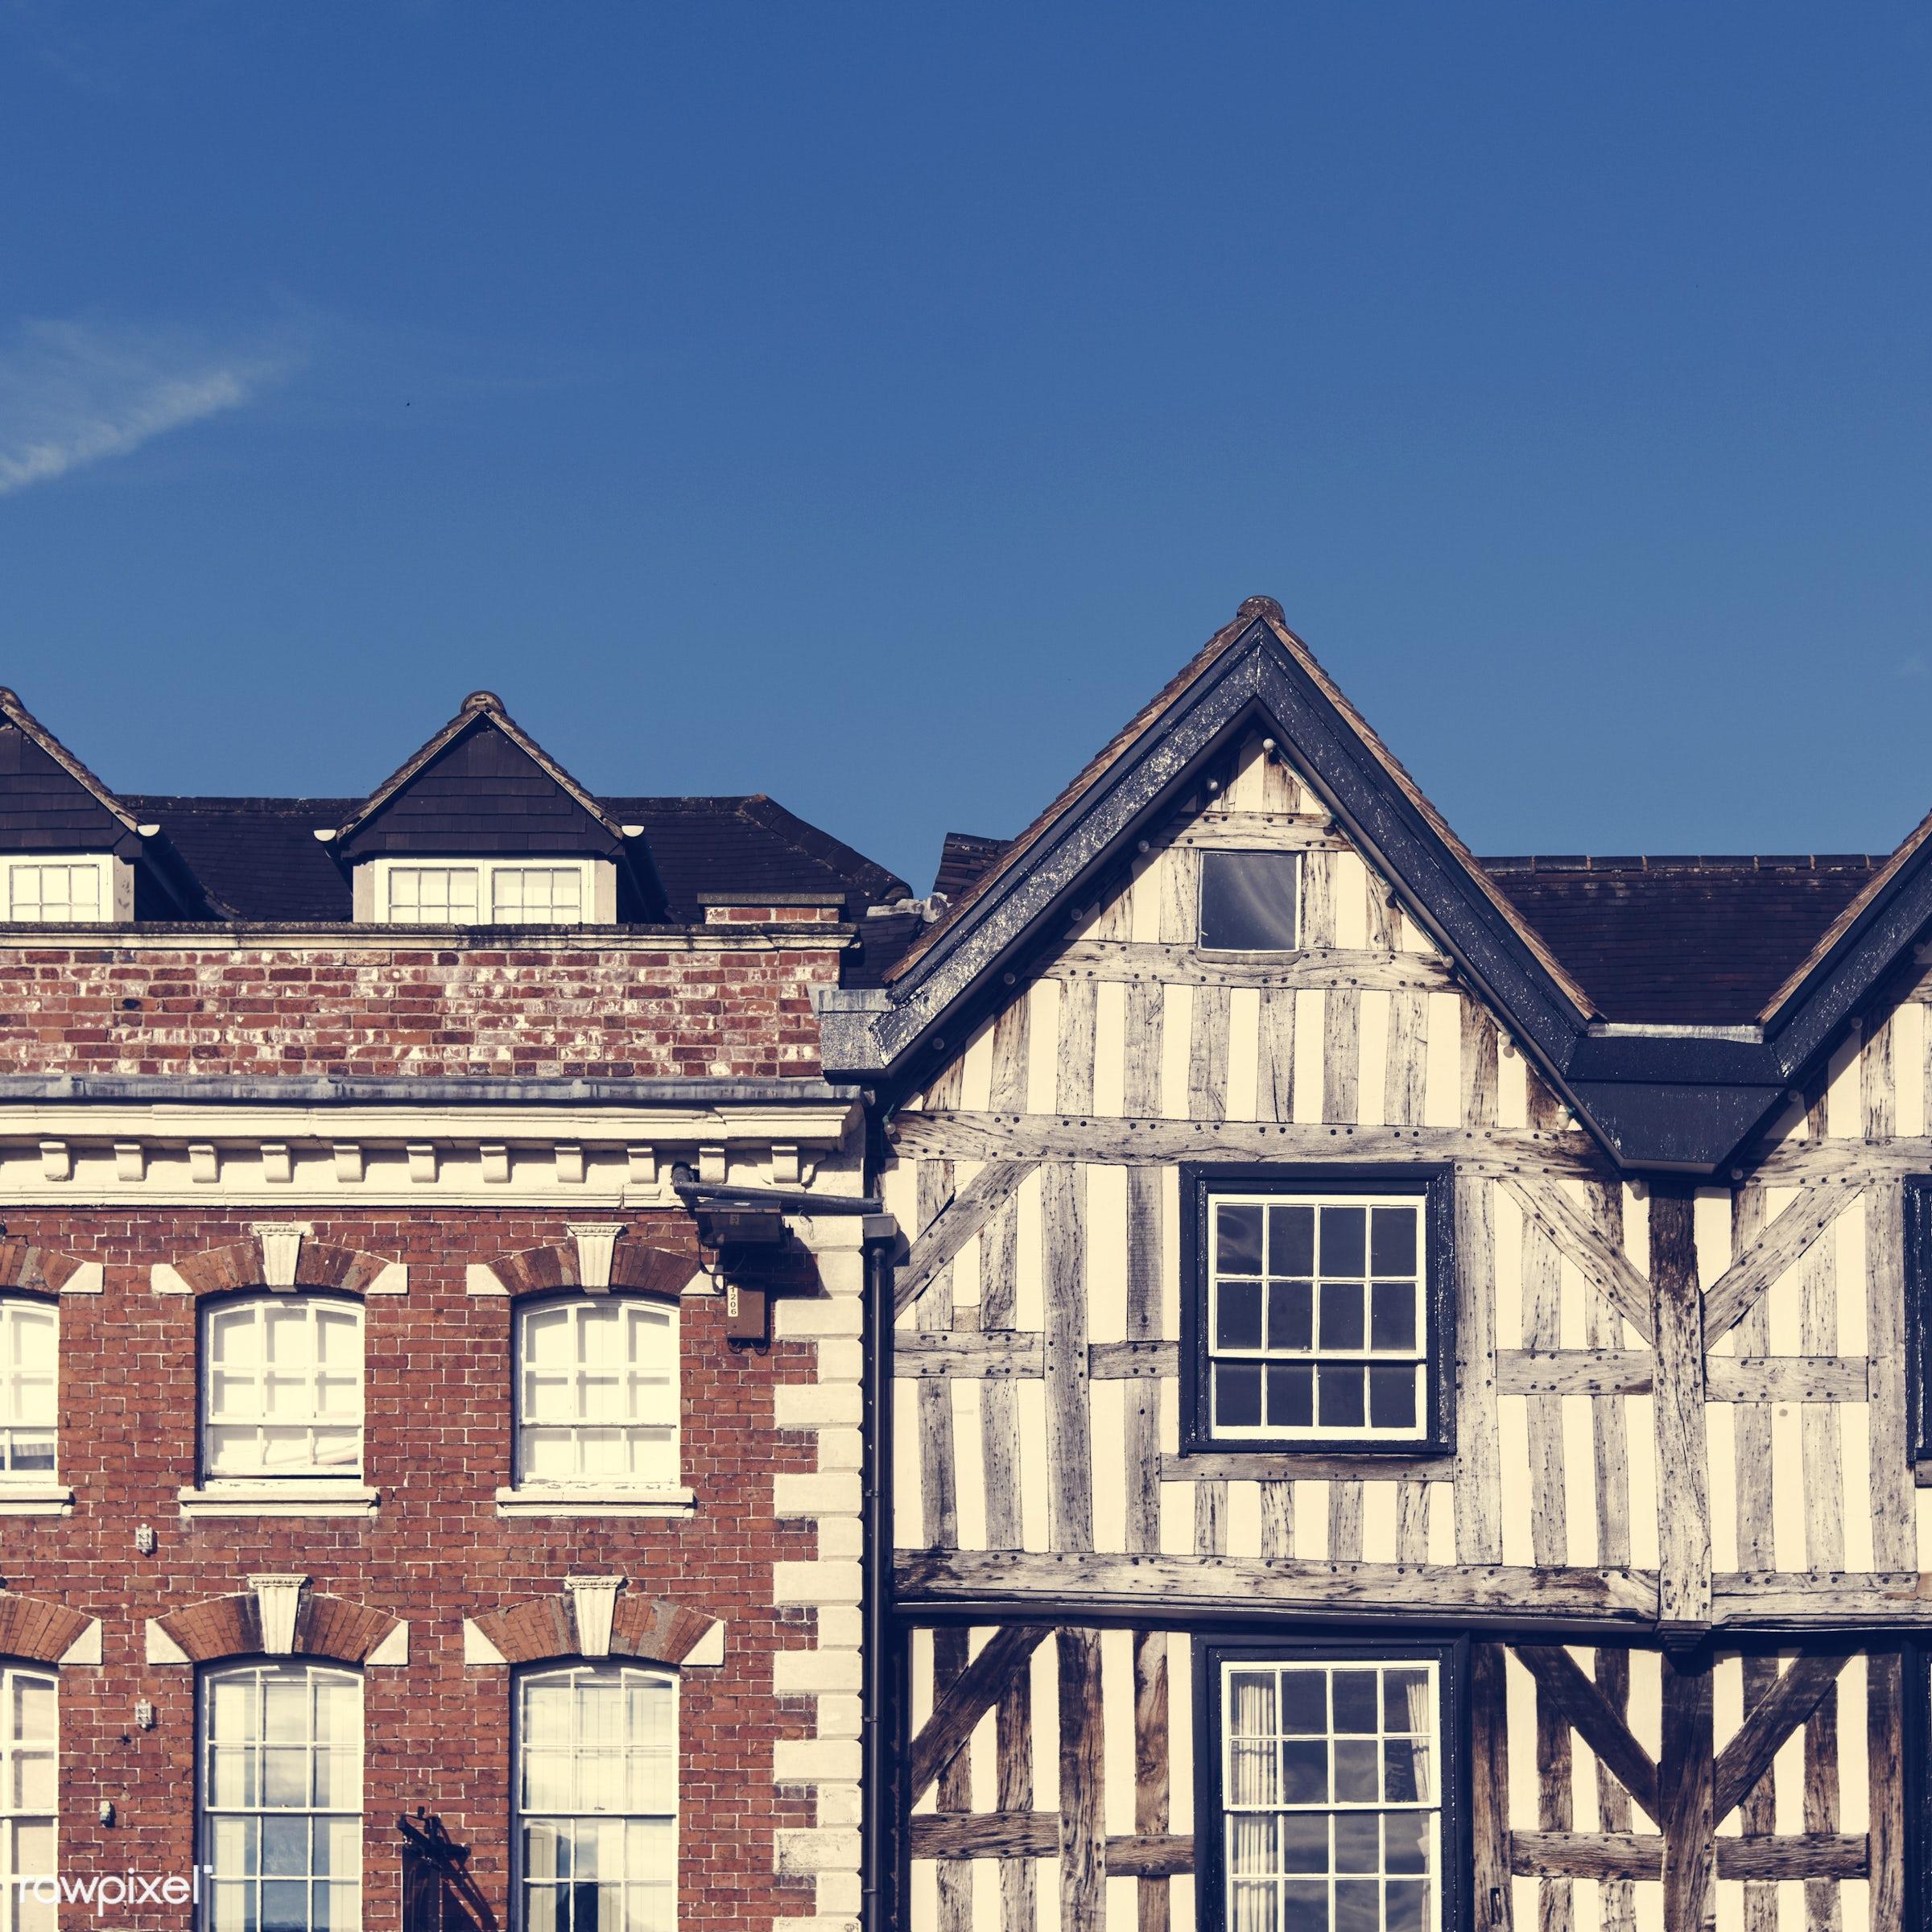 accommodation, architecture, british, building, cement, city, community, construction, culture, decor, decorate, decoration...